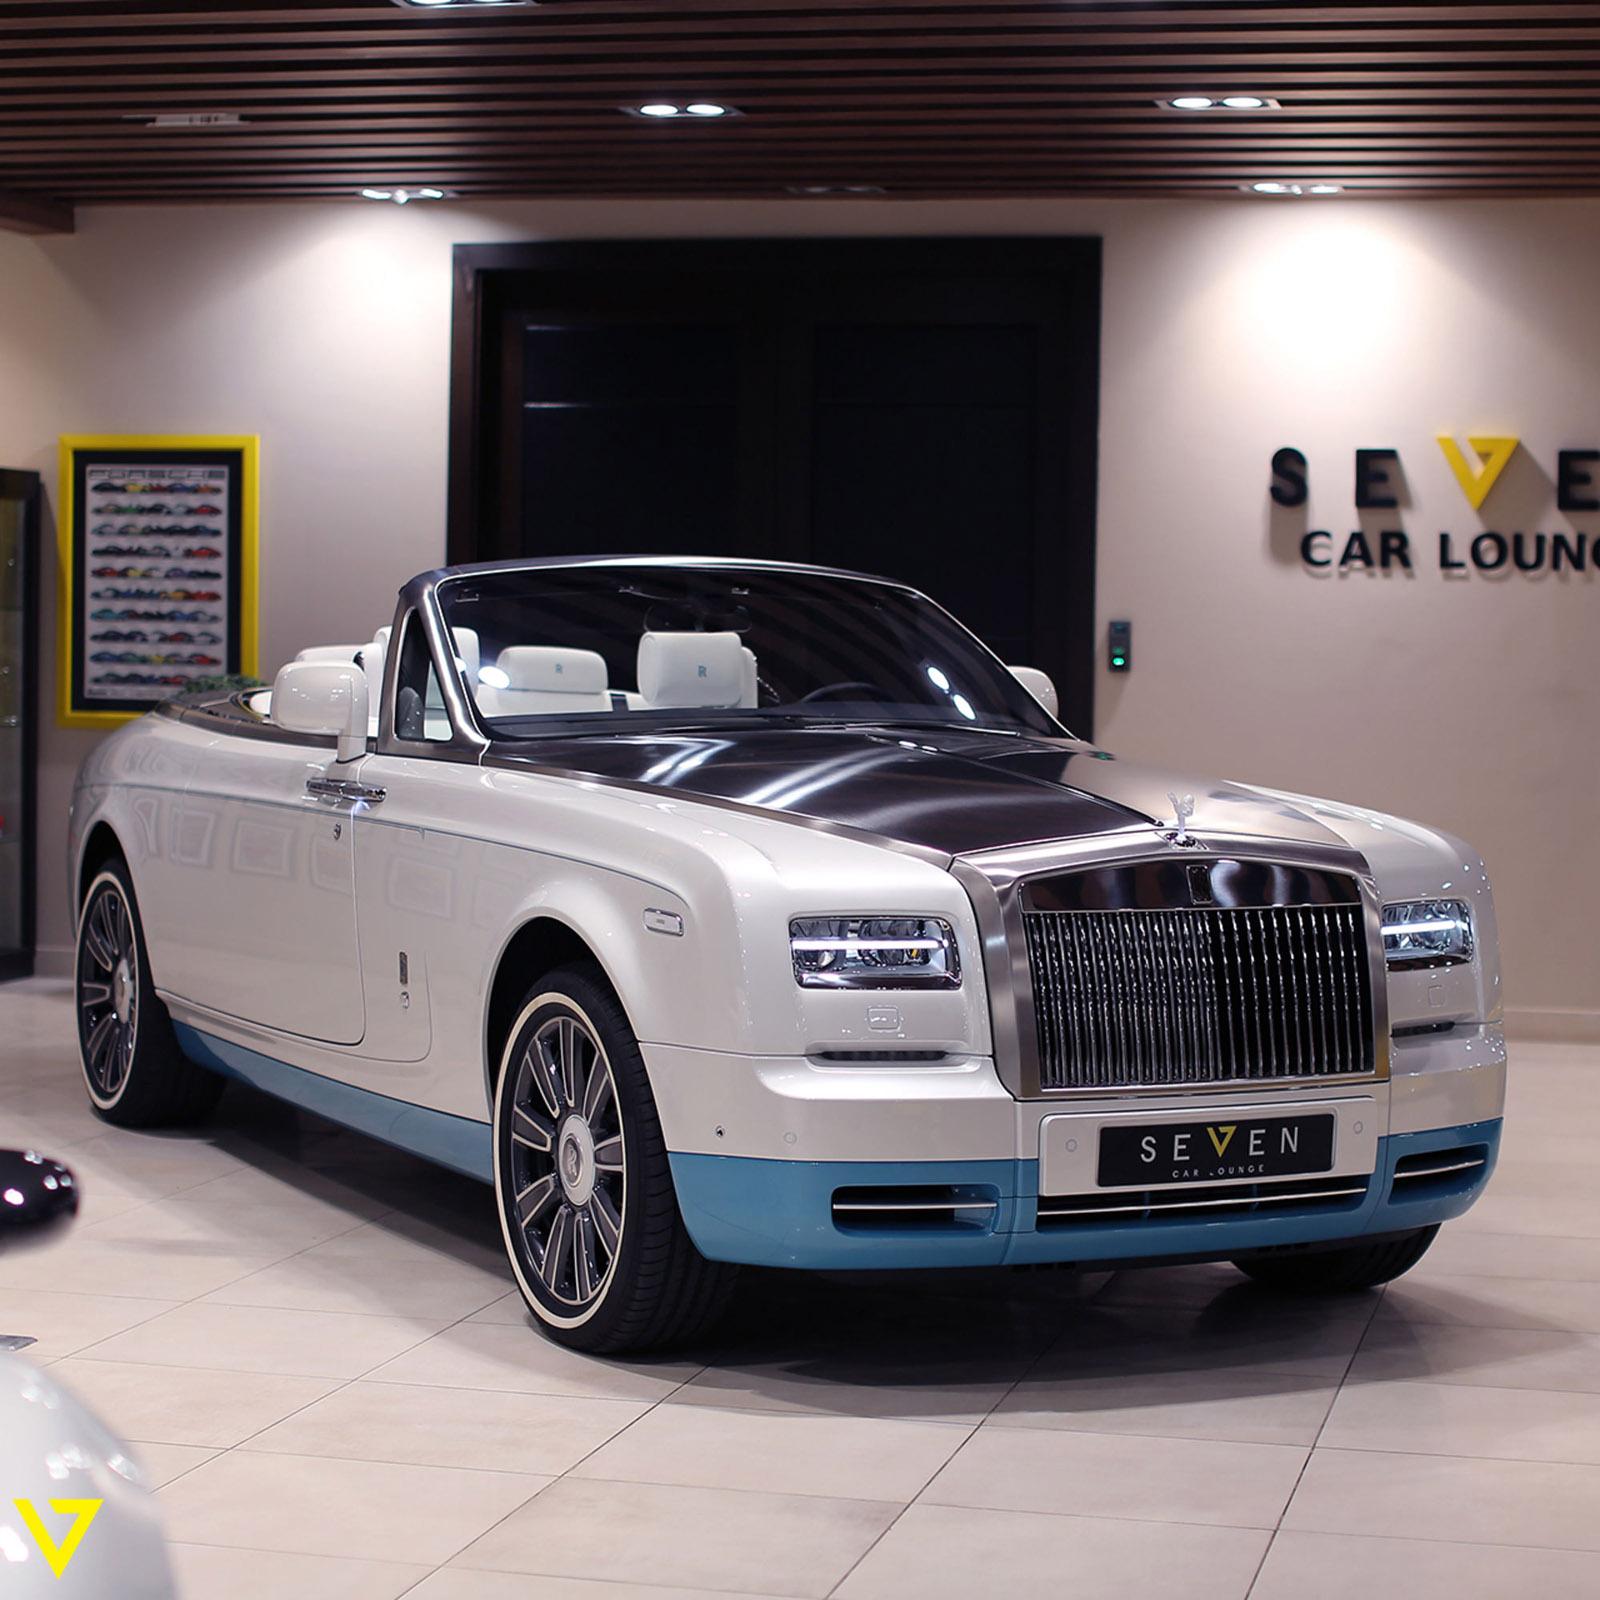 Rolls-Royce_Phantom_Drophead_Coupe_Last-of-Last_edition_07